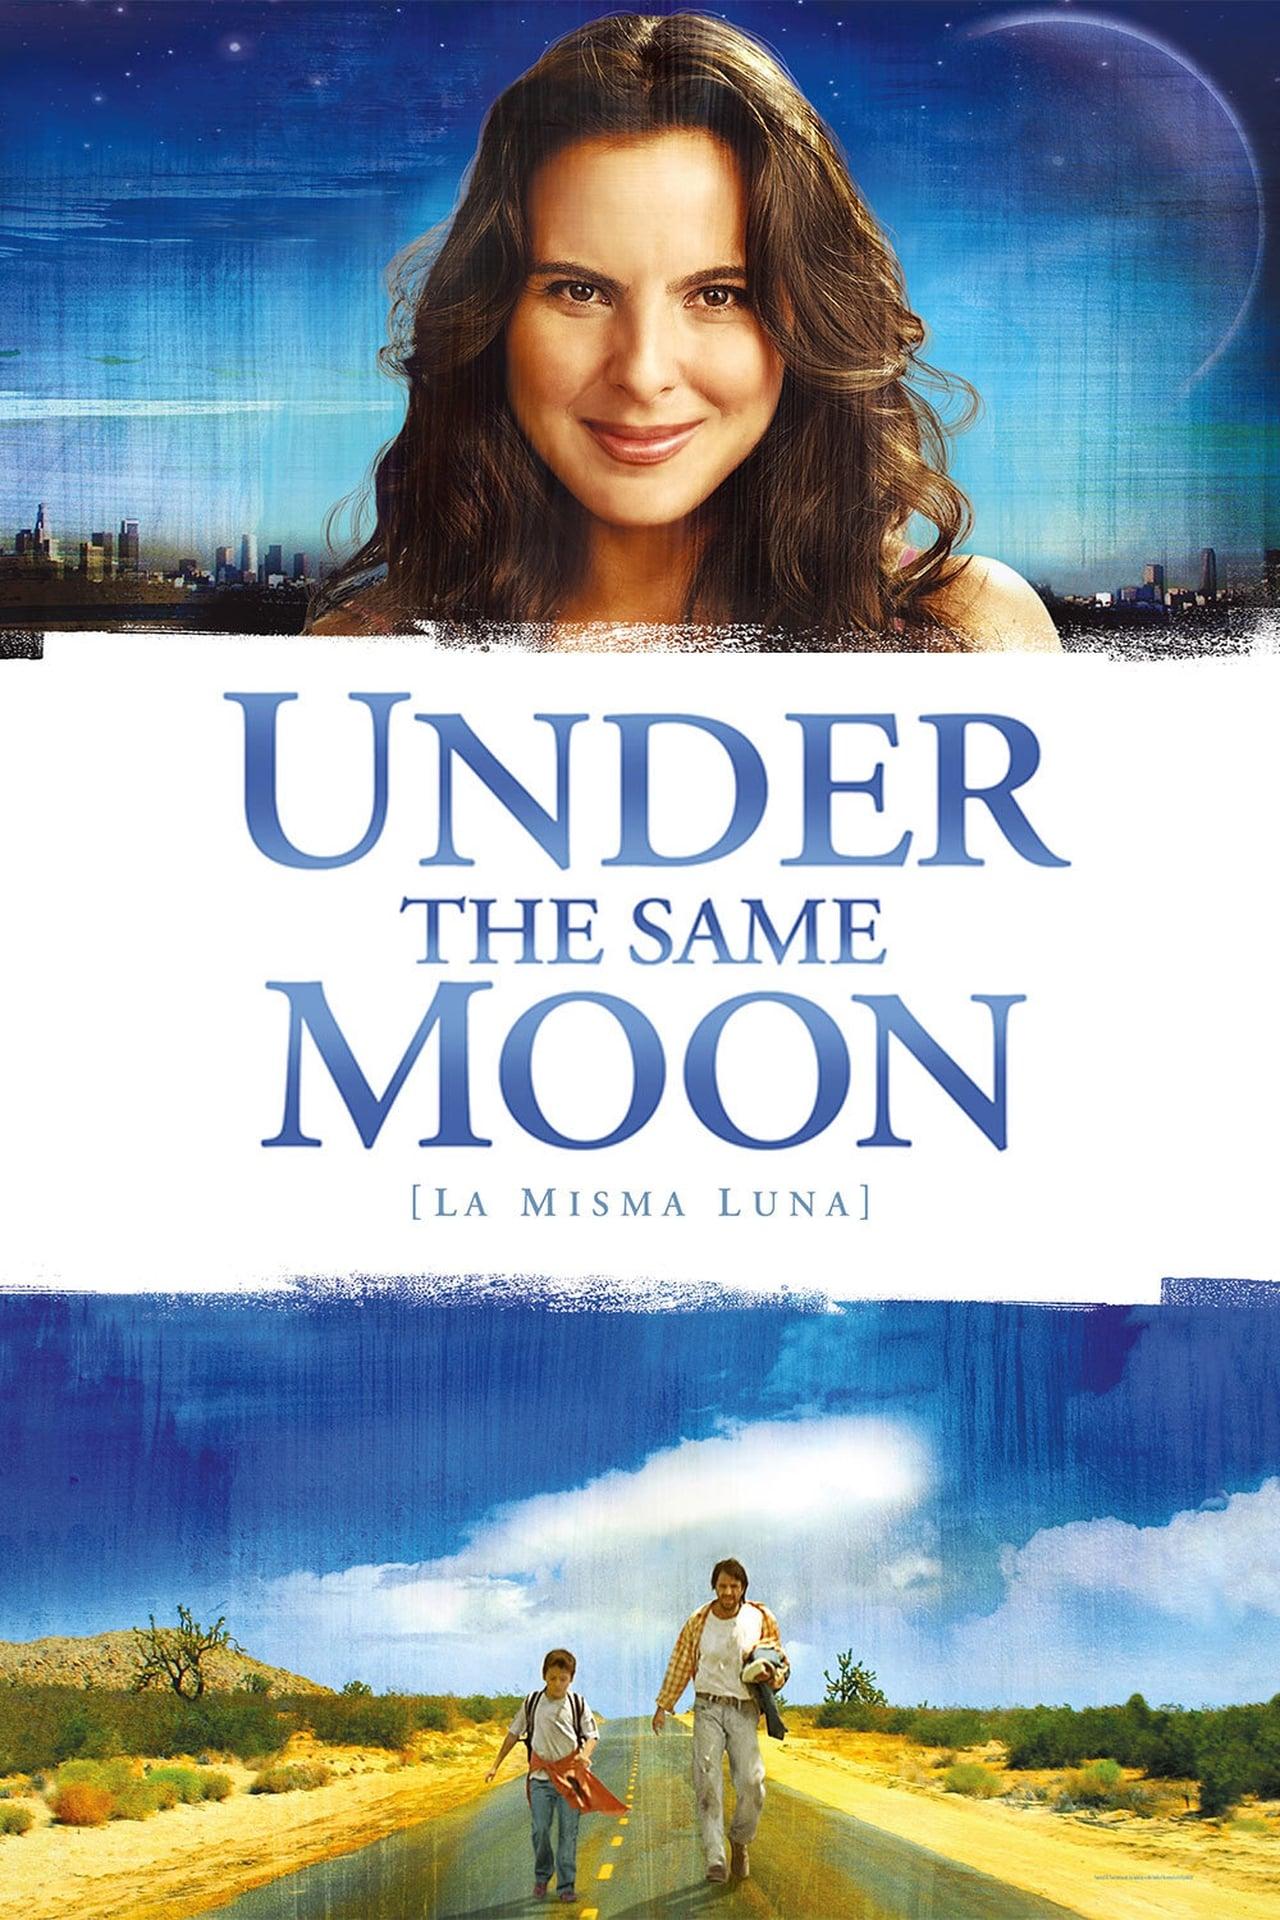 Under The Same Moon La Misma Luna Wiki Synopsis